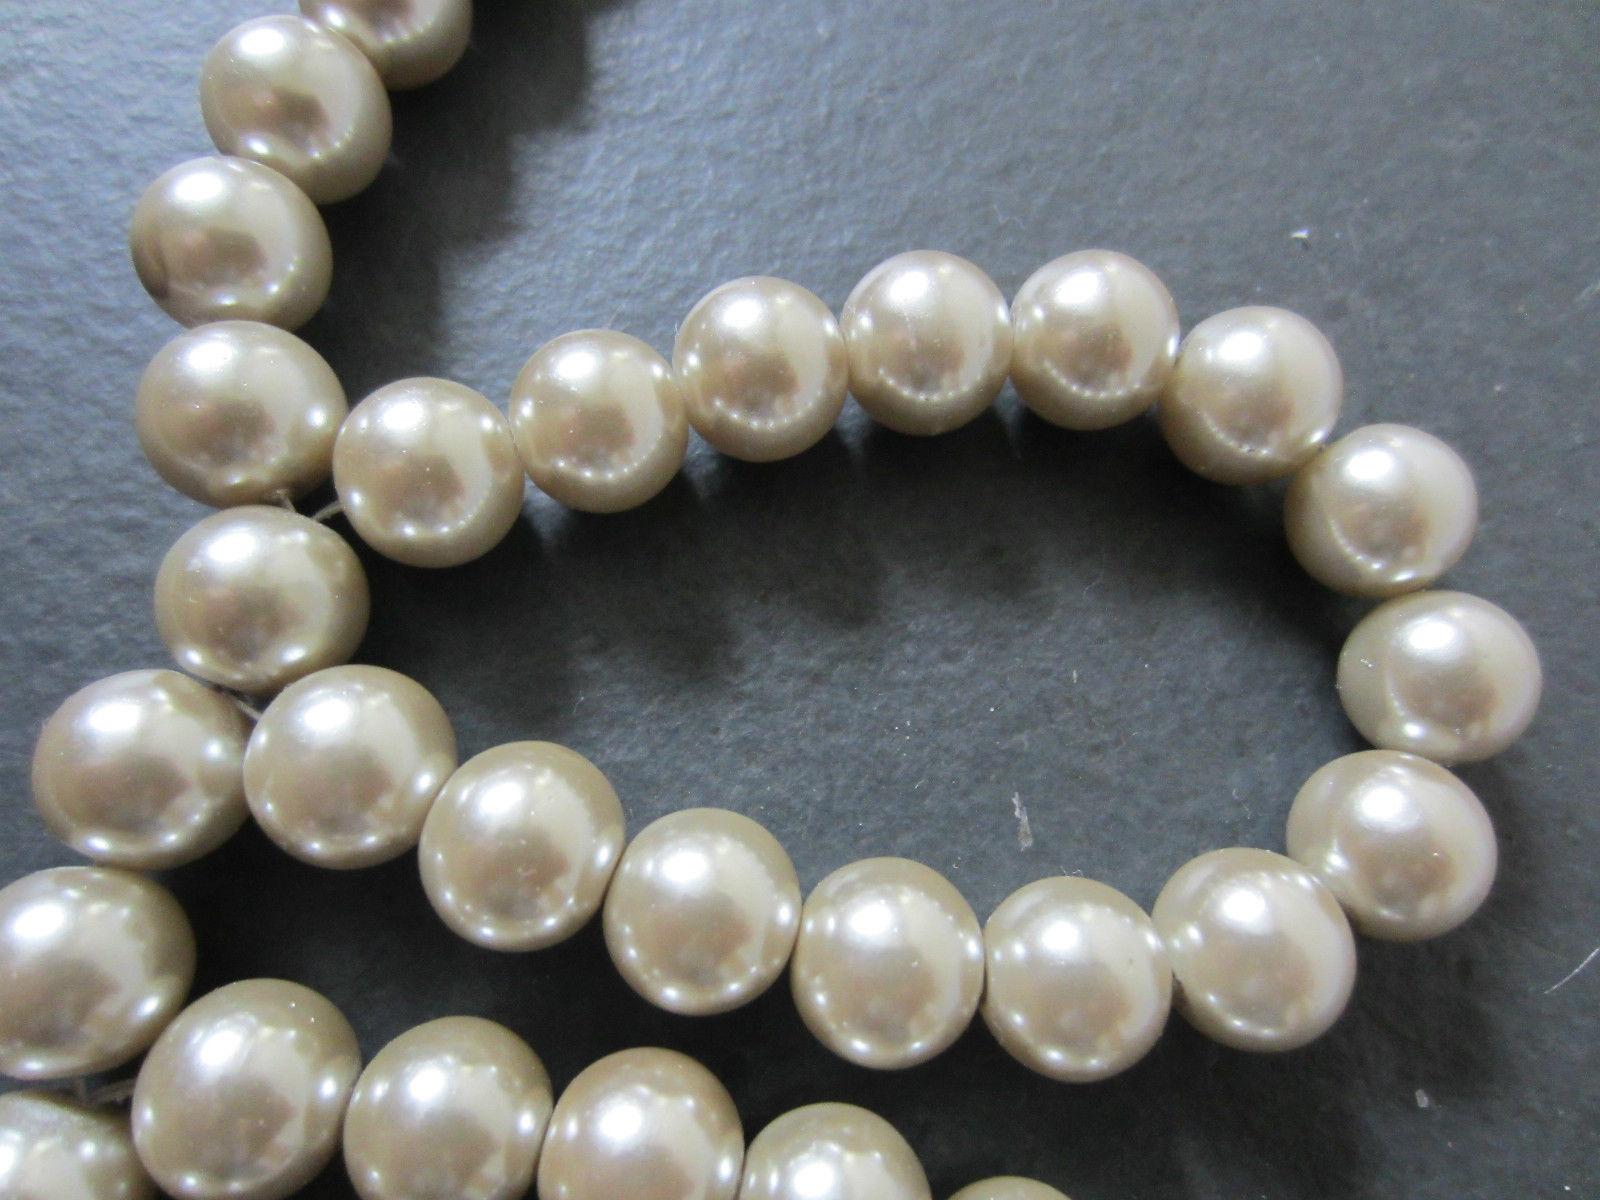 paul smith femmes bijouterie collier de perles ebay. Black Bedroom Furniture Sets. Home Design Ideas